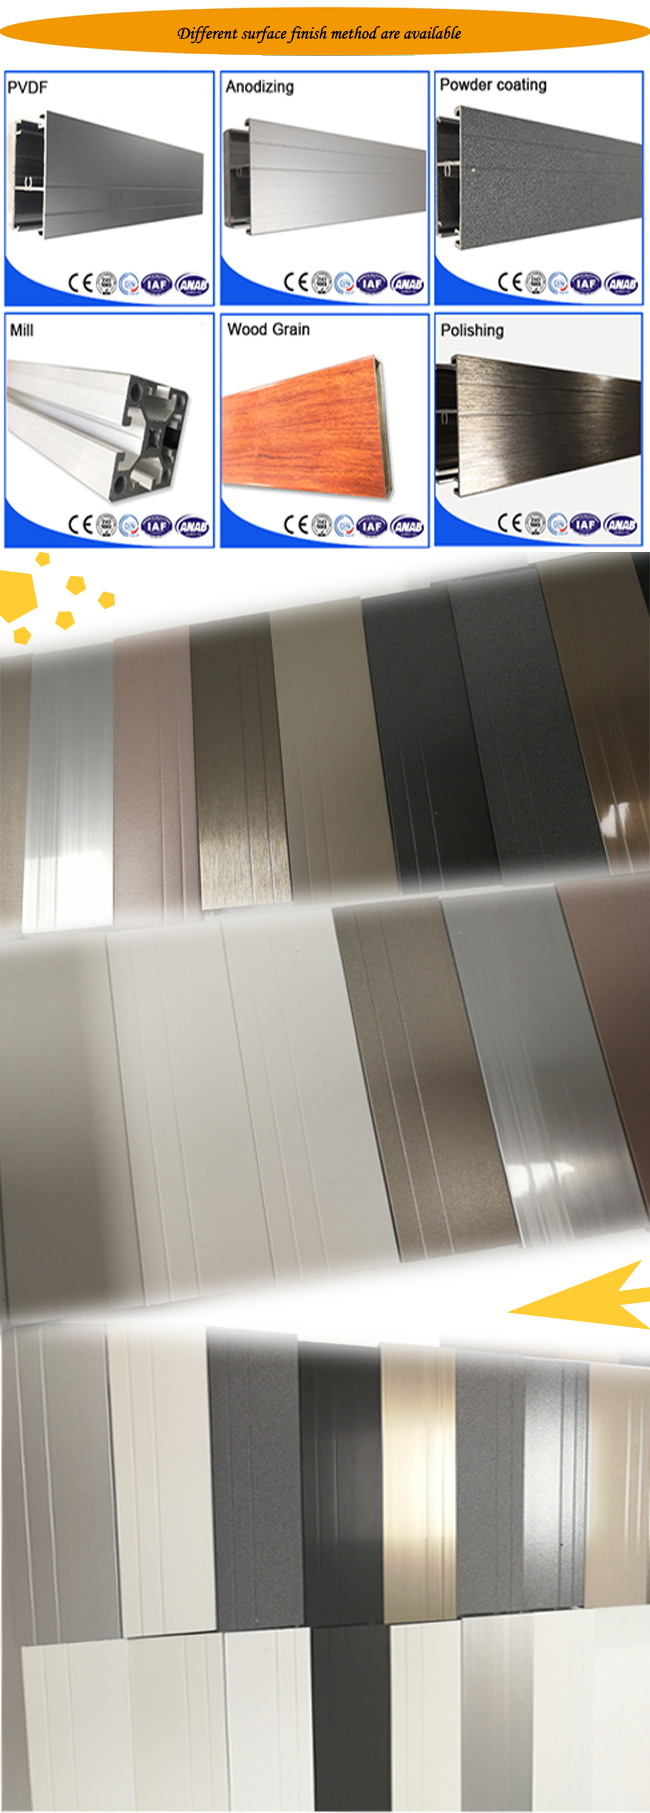 OEM Aluminum/Aluminium Extrusion Parts Profile with RoHS/Ce/ISO/As2047/Aama